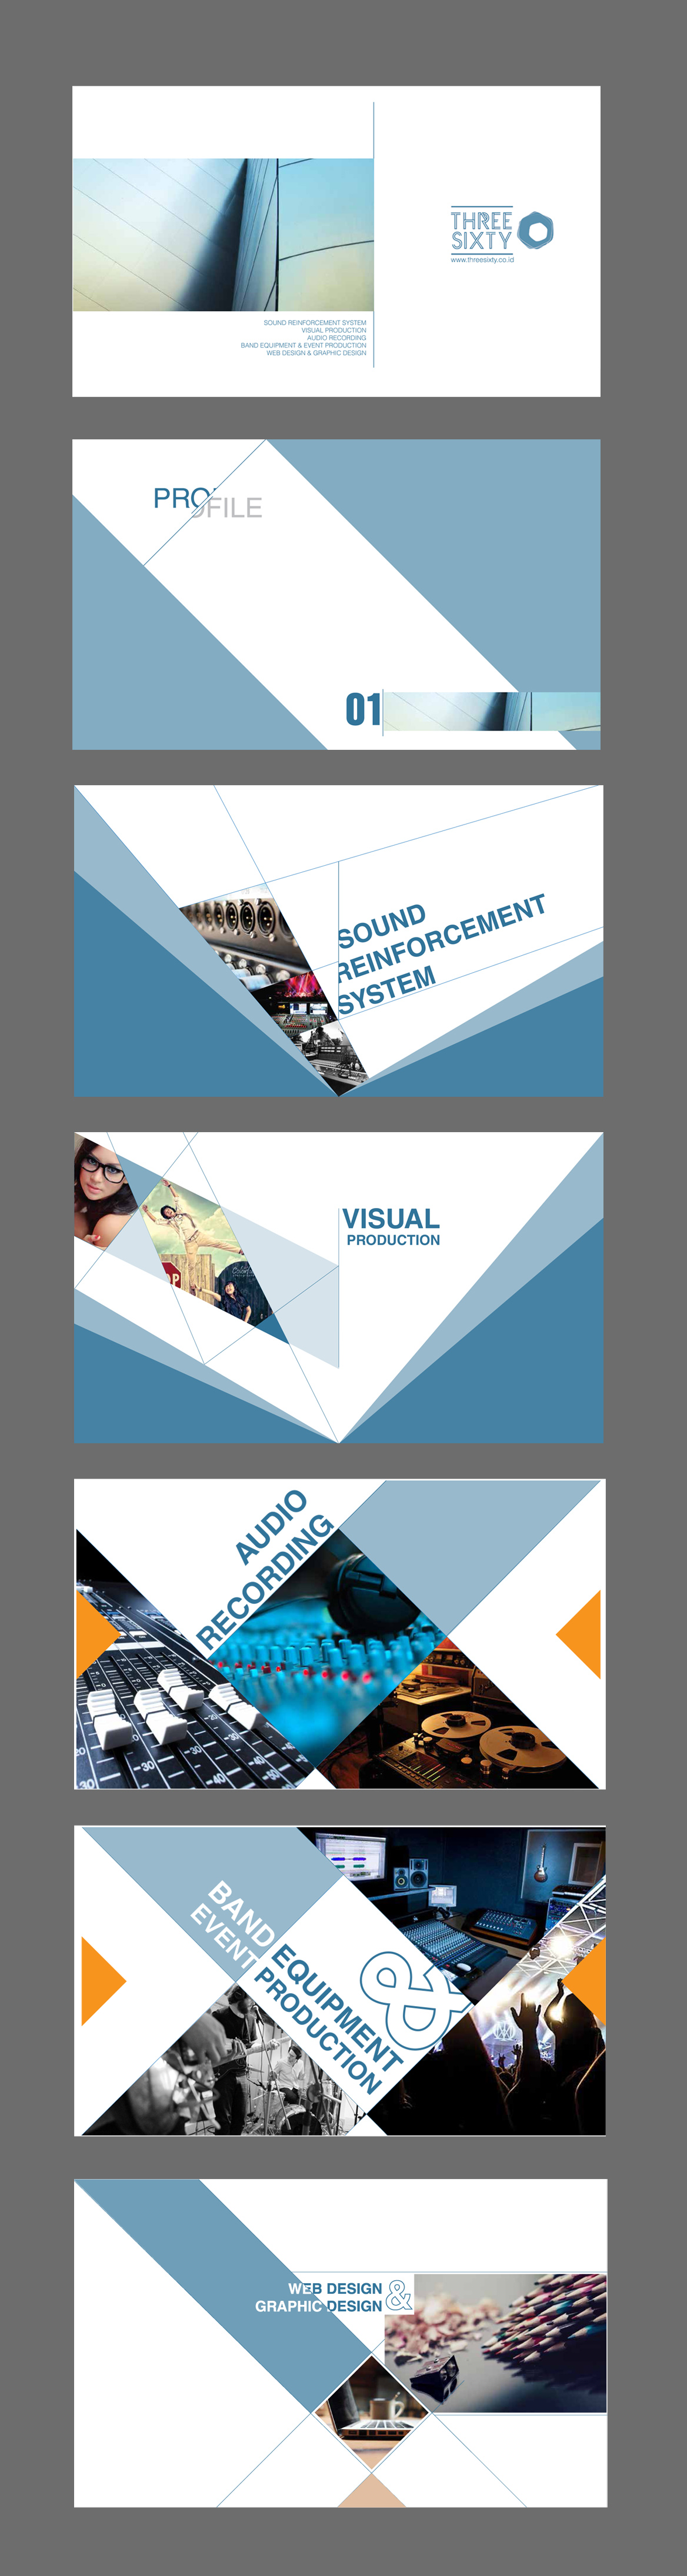 threesixty company profile template | Presentation | Pinterest ...